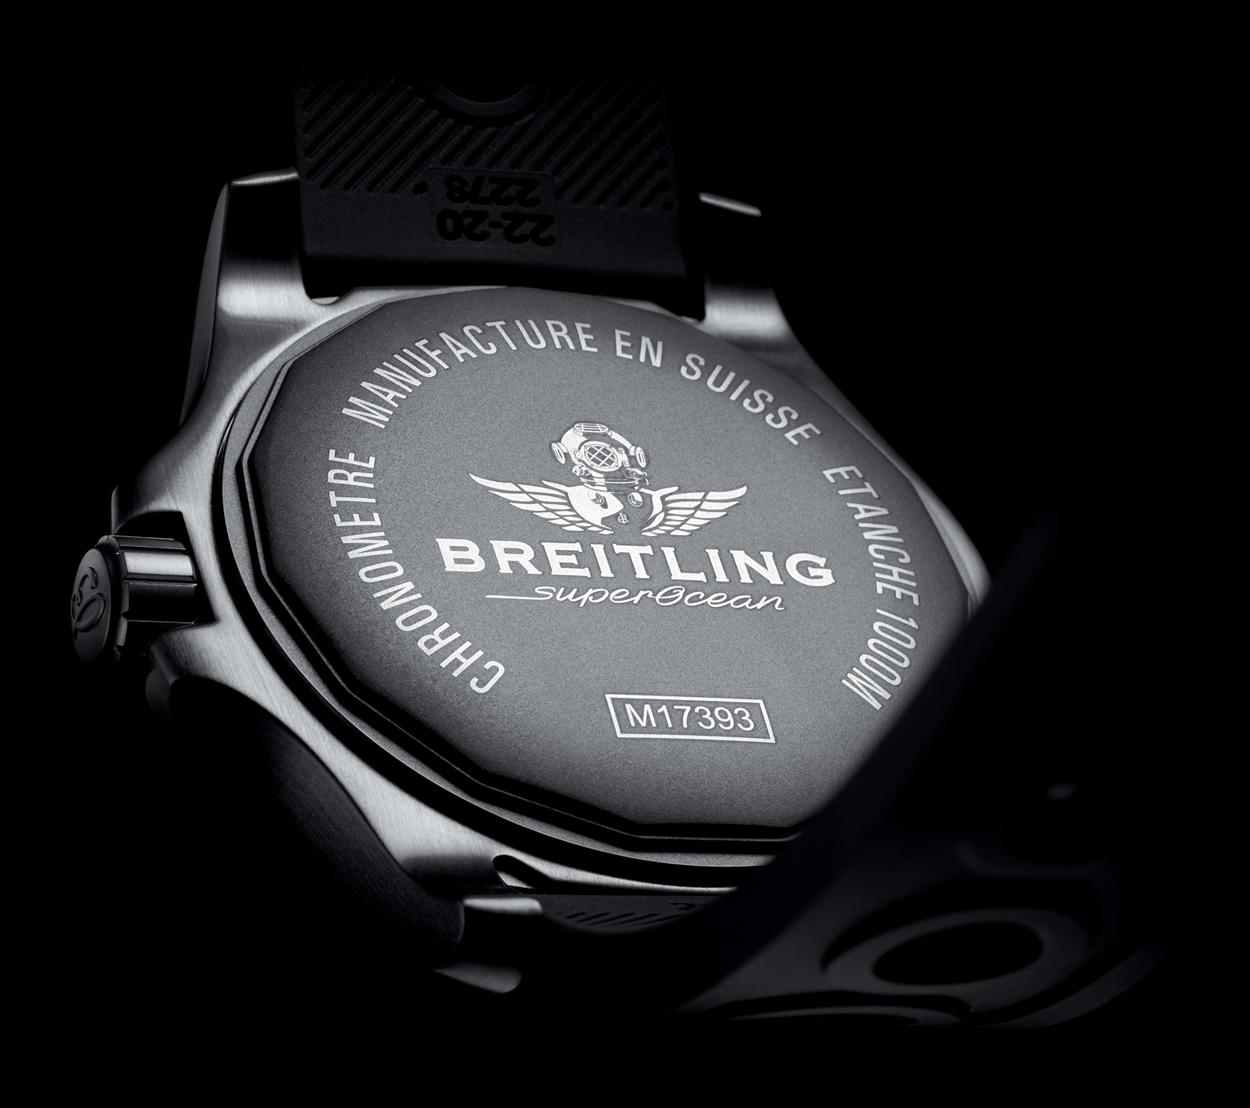 Breitling-Superocean-44-Special-4.jpg